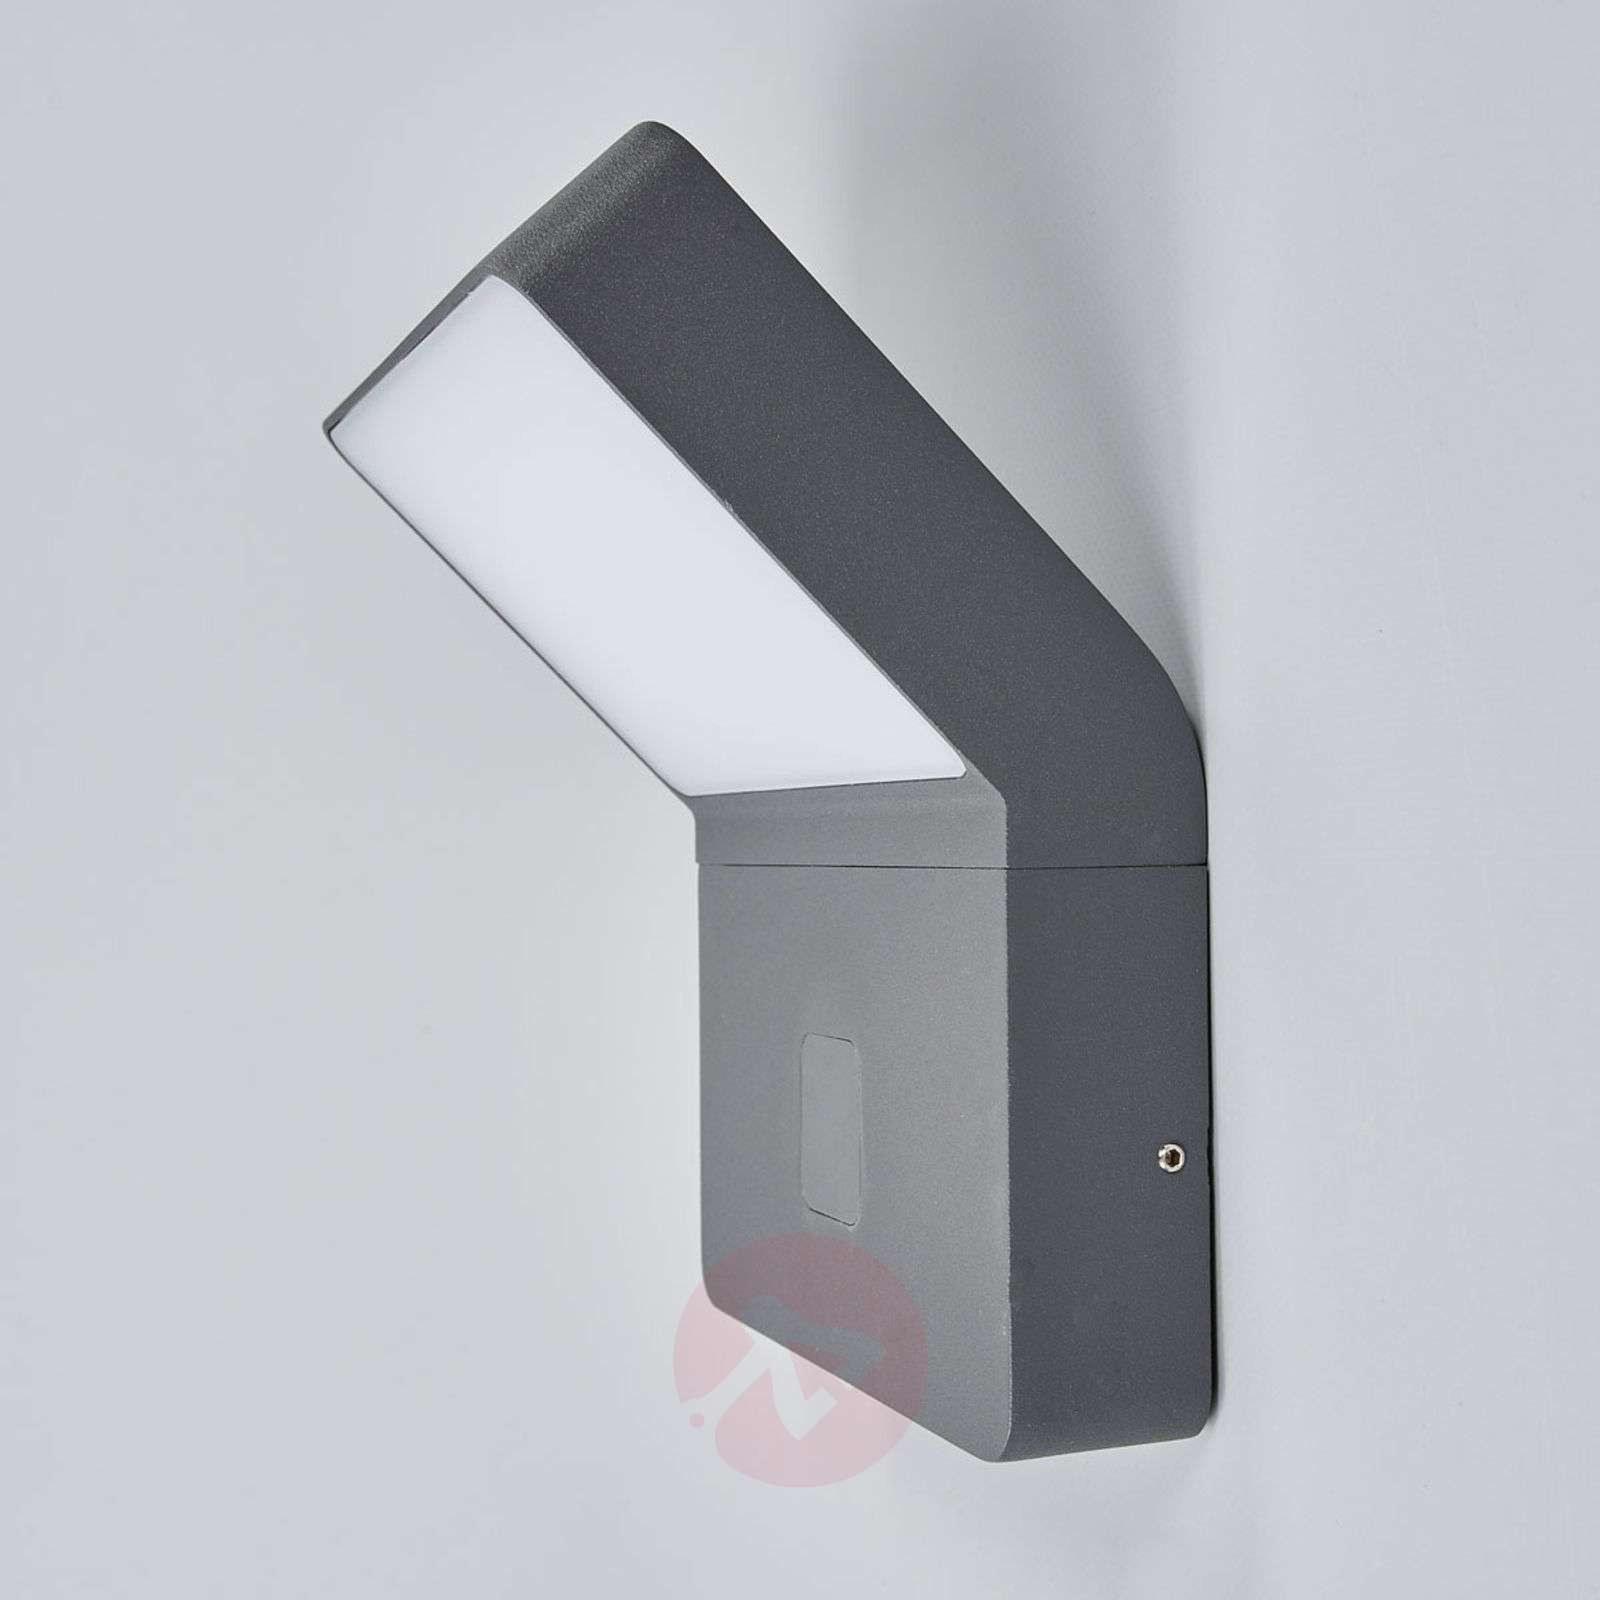 Evelin LED outdoor wall light with sensor-9618106-03